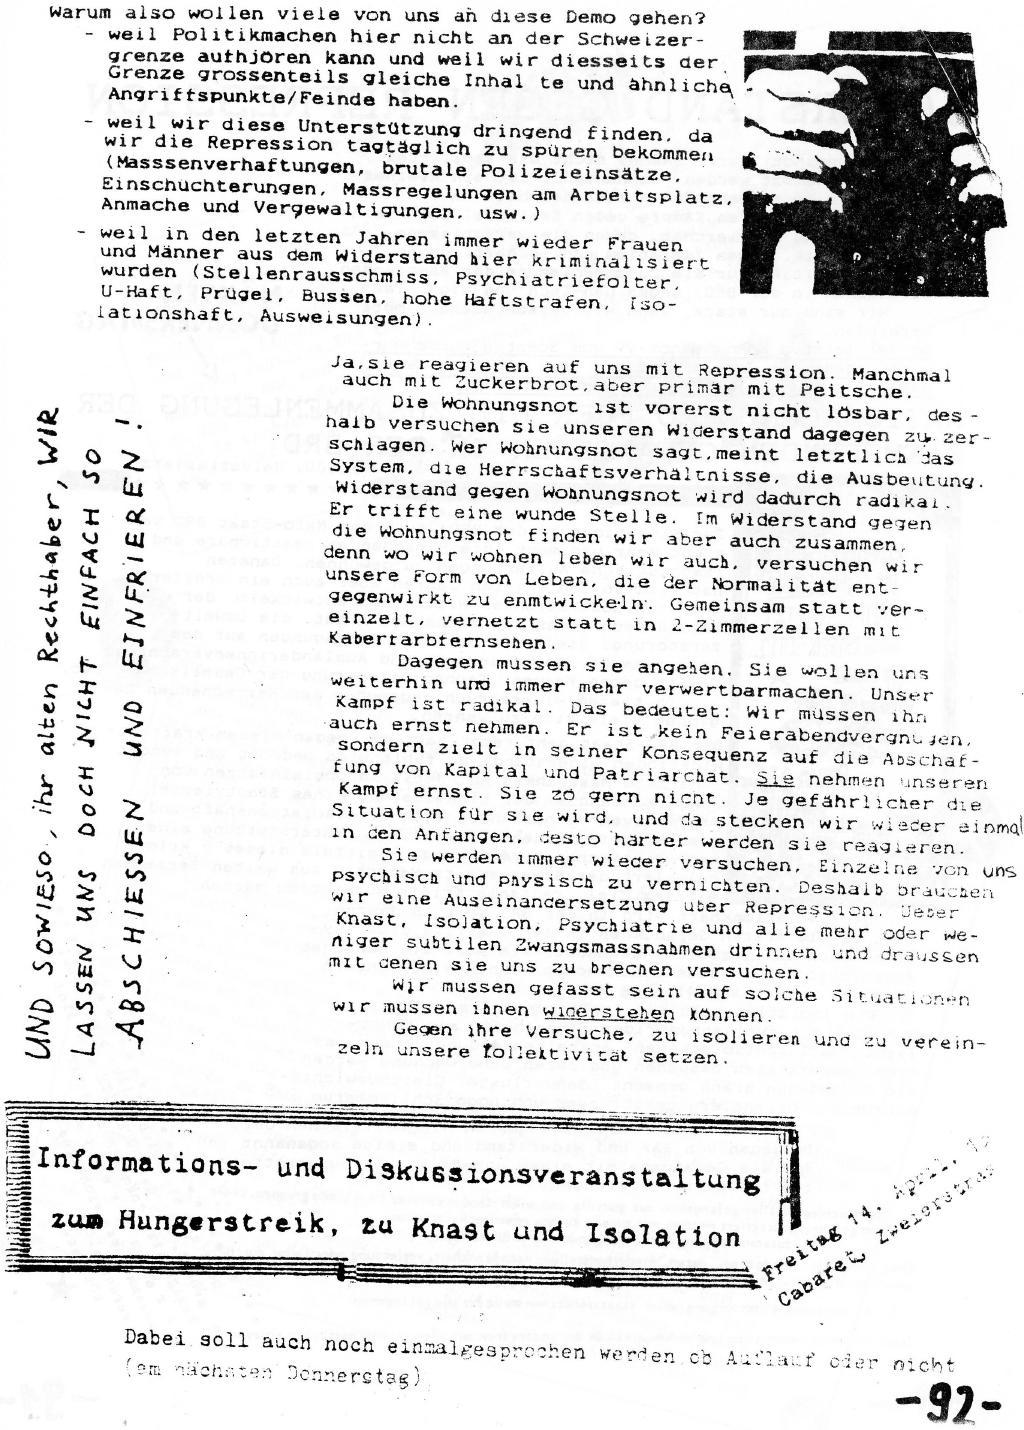 Belgien_Doku_Besetzung_EG_Kommission_1989_094